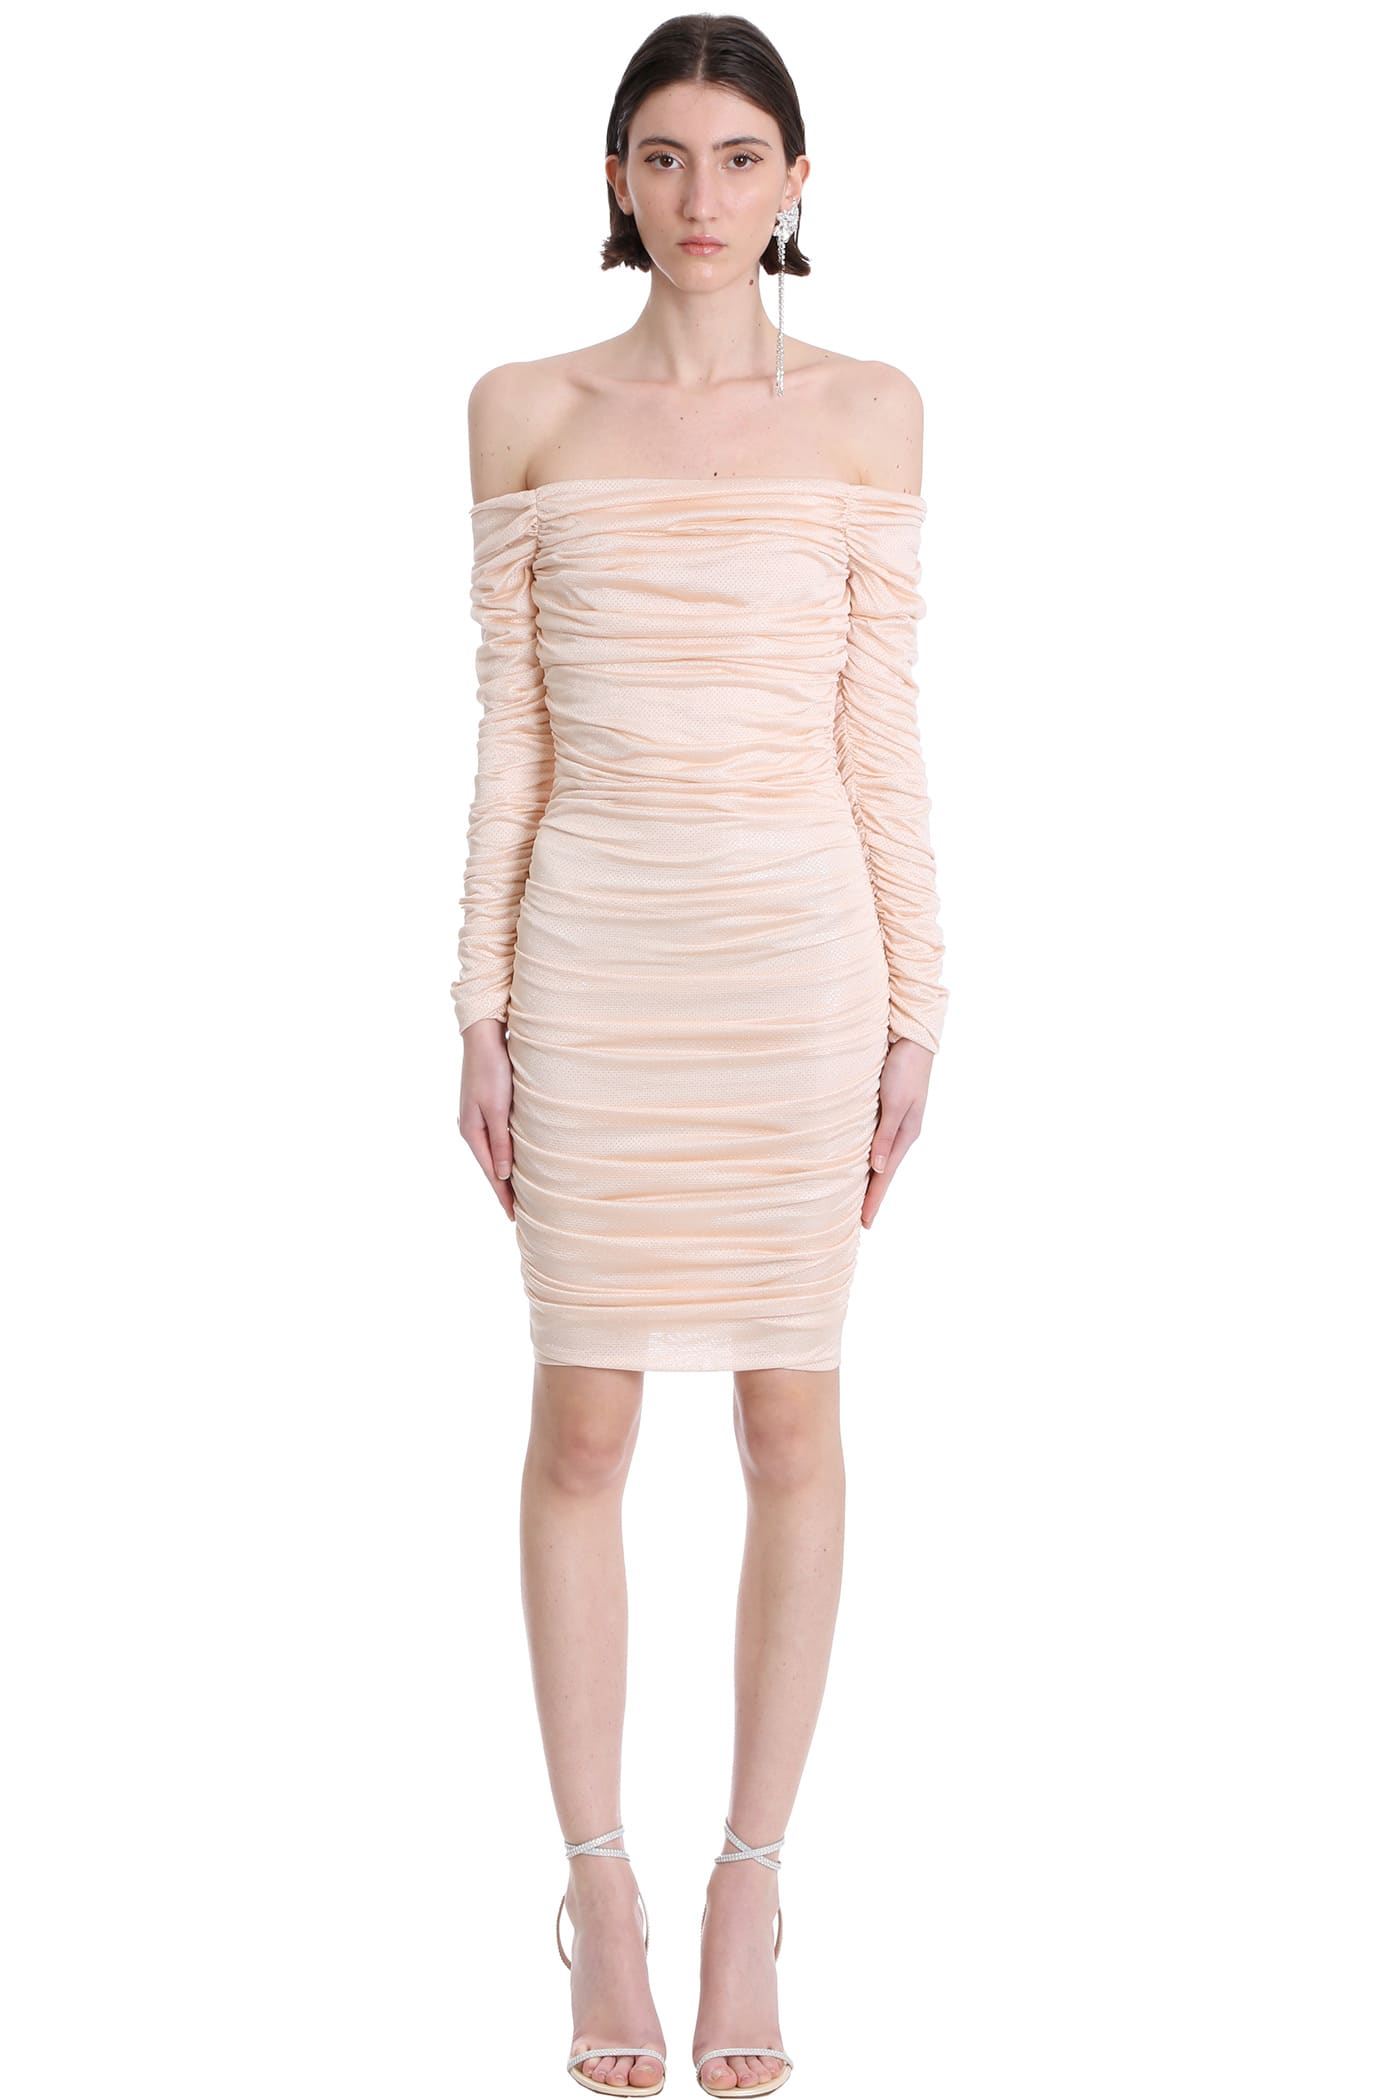 Alexandre Vauthier Dress In Rose-pink Viscose